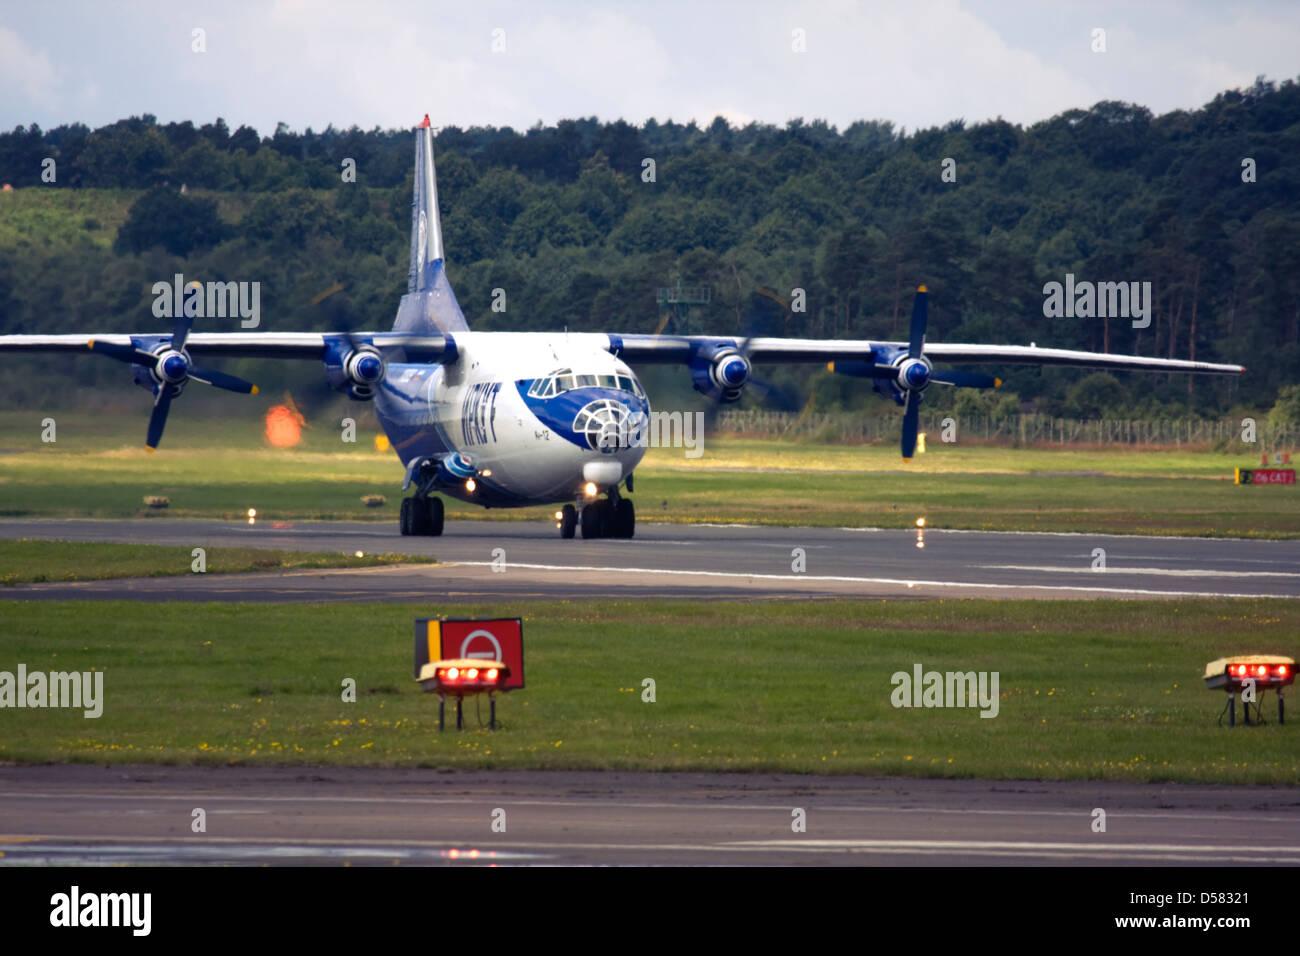 Gromov Air (Irkut-Avia) Antonov An-12 on runway at Farnborough International Airshow 2012 Stock Photo